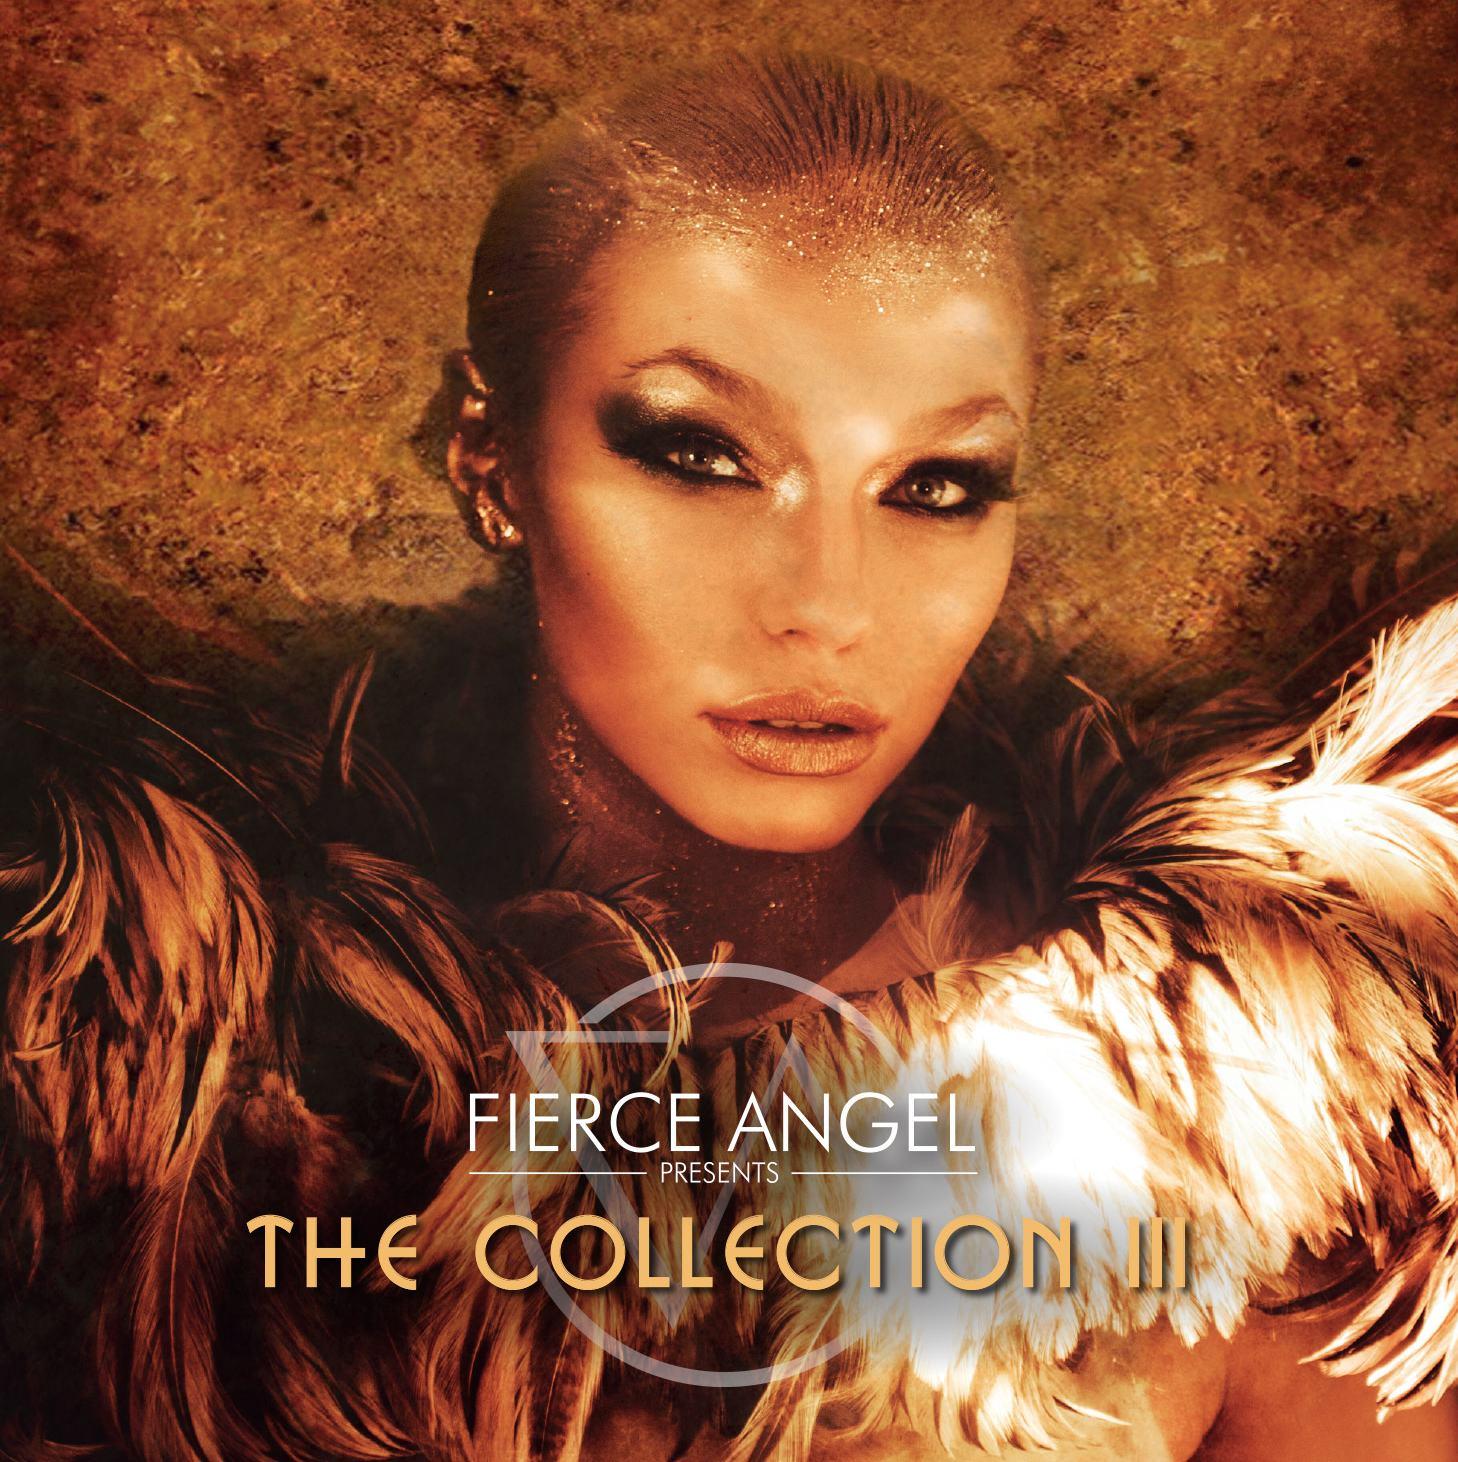 The Collection Vol III 2CD - Fierce Angel